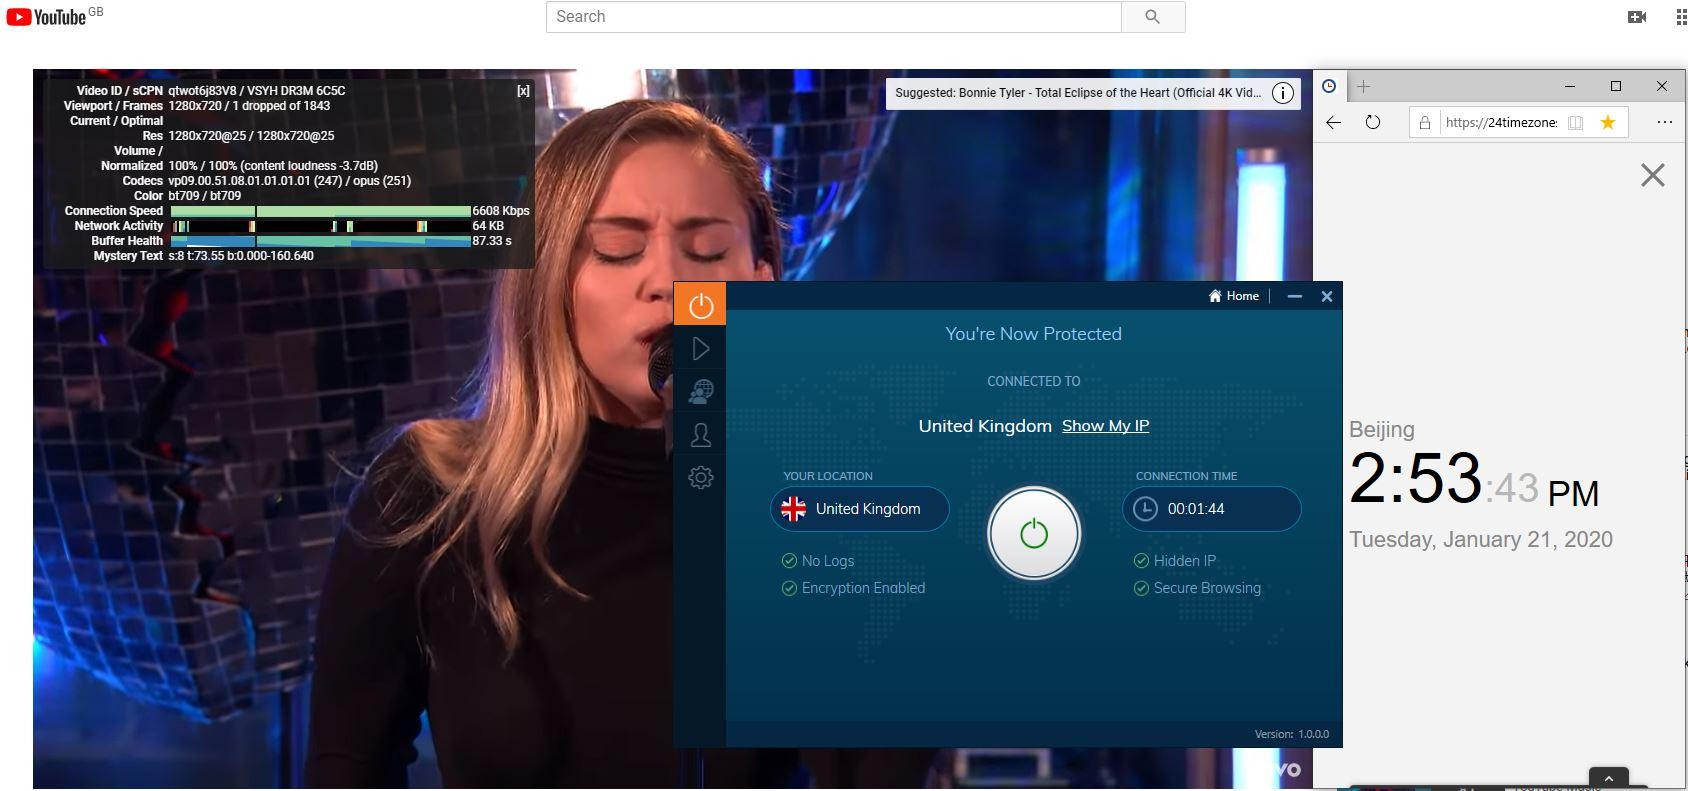 Windows10 IvacyVPN UK 中国VPN翻墙 科学上网 Youtube测速-20200121